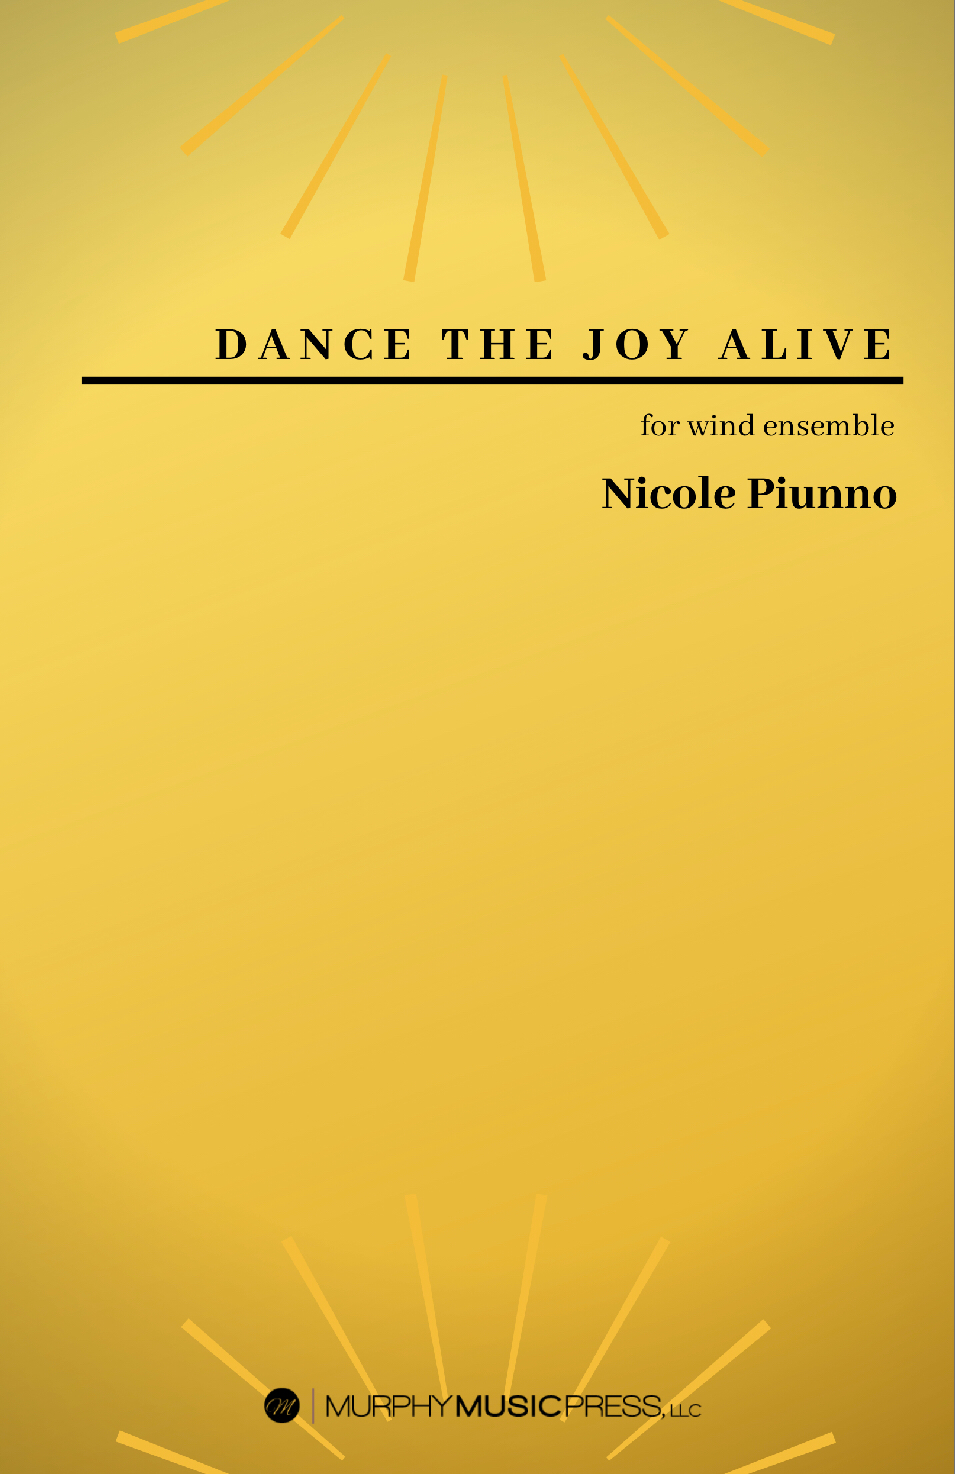 Dance The Joy Alive  by Nicole Piunno